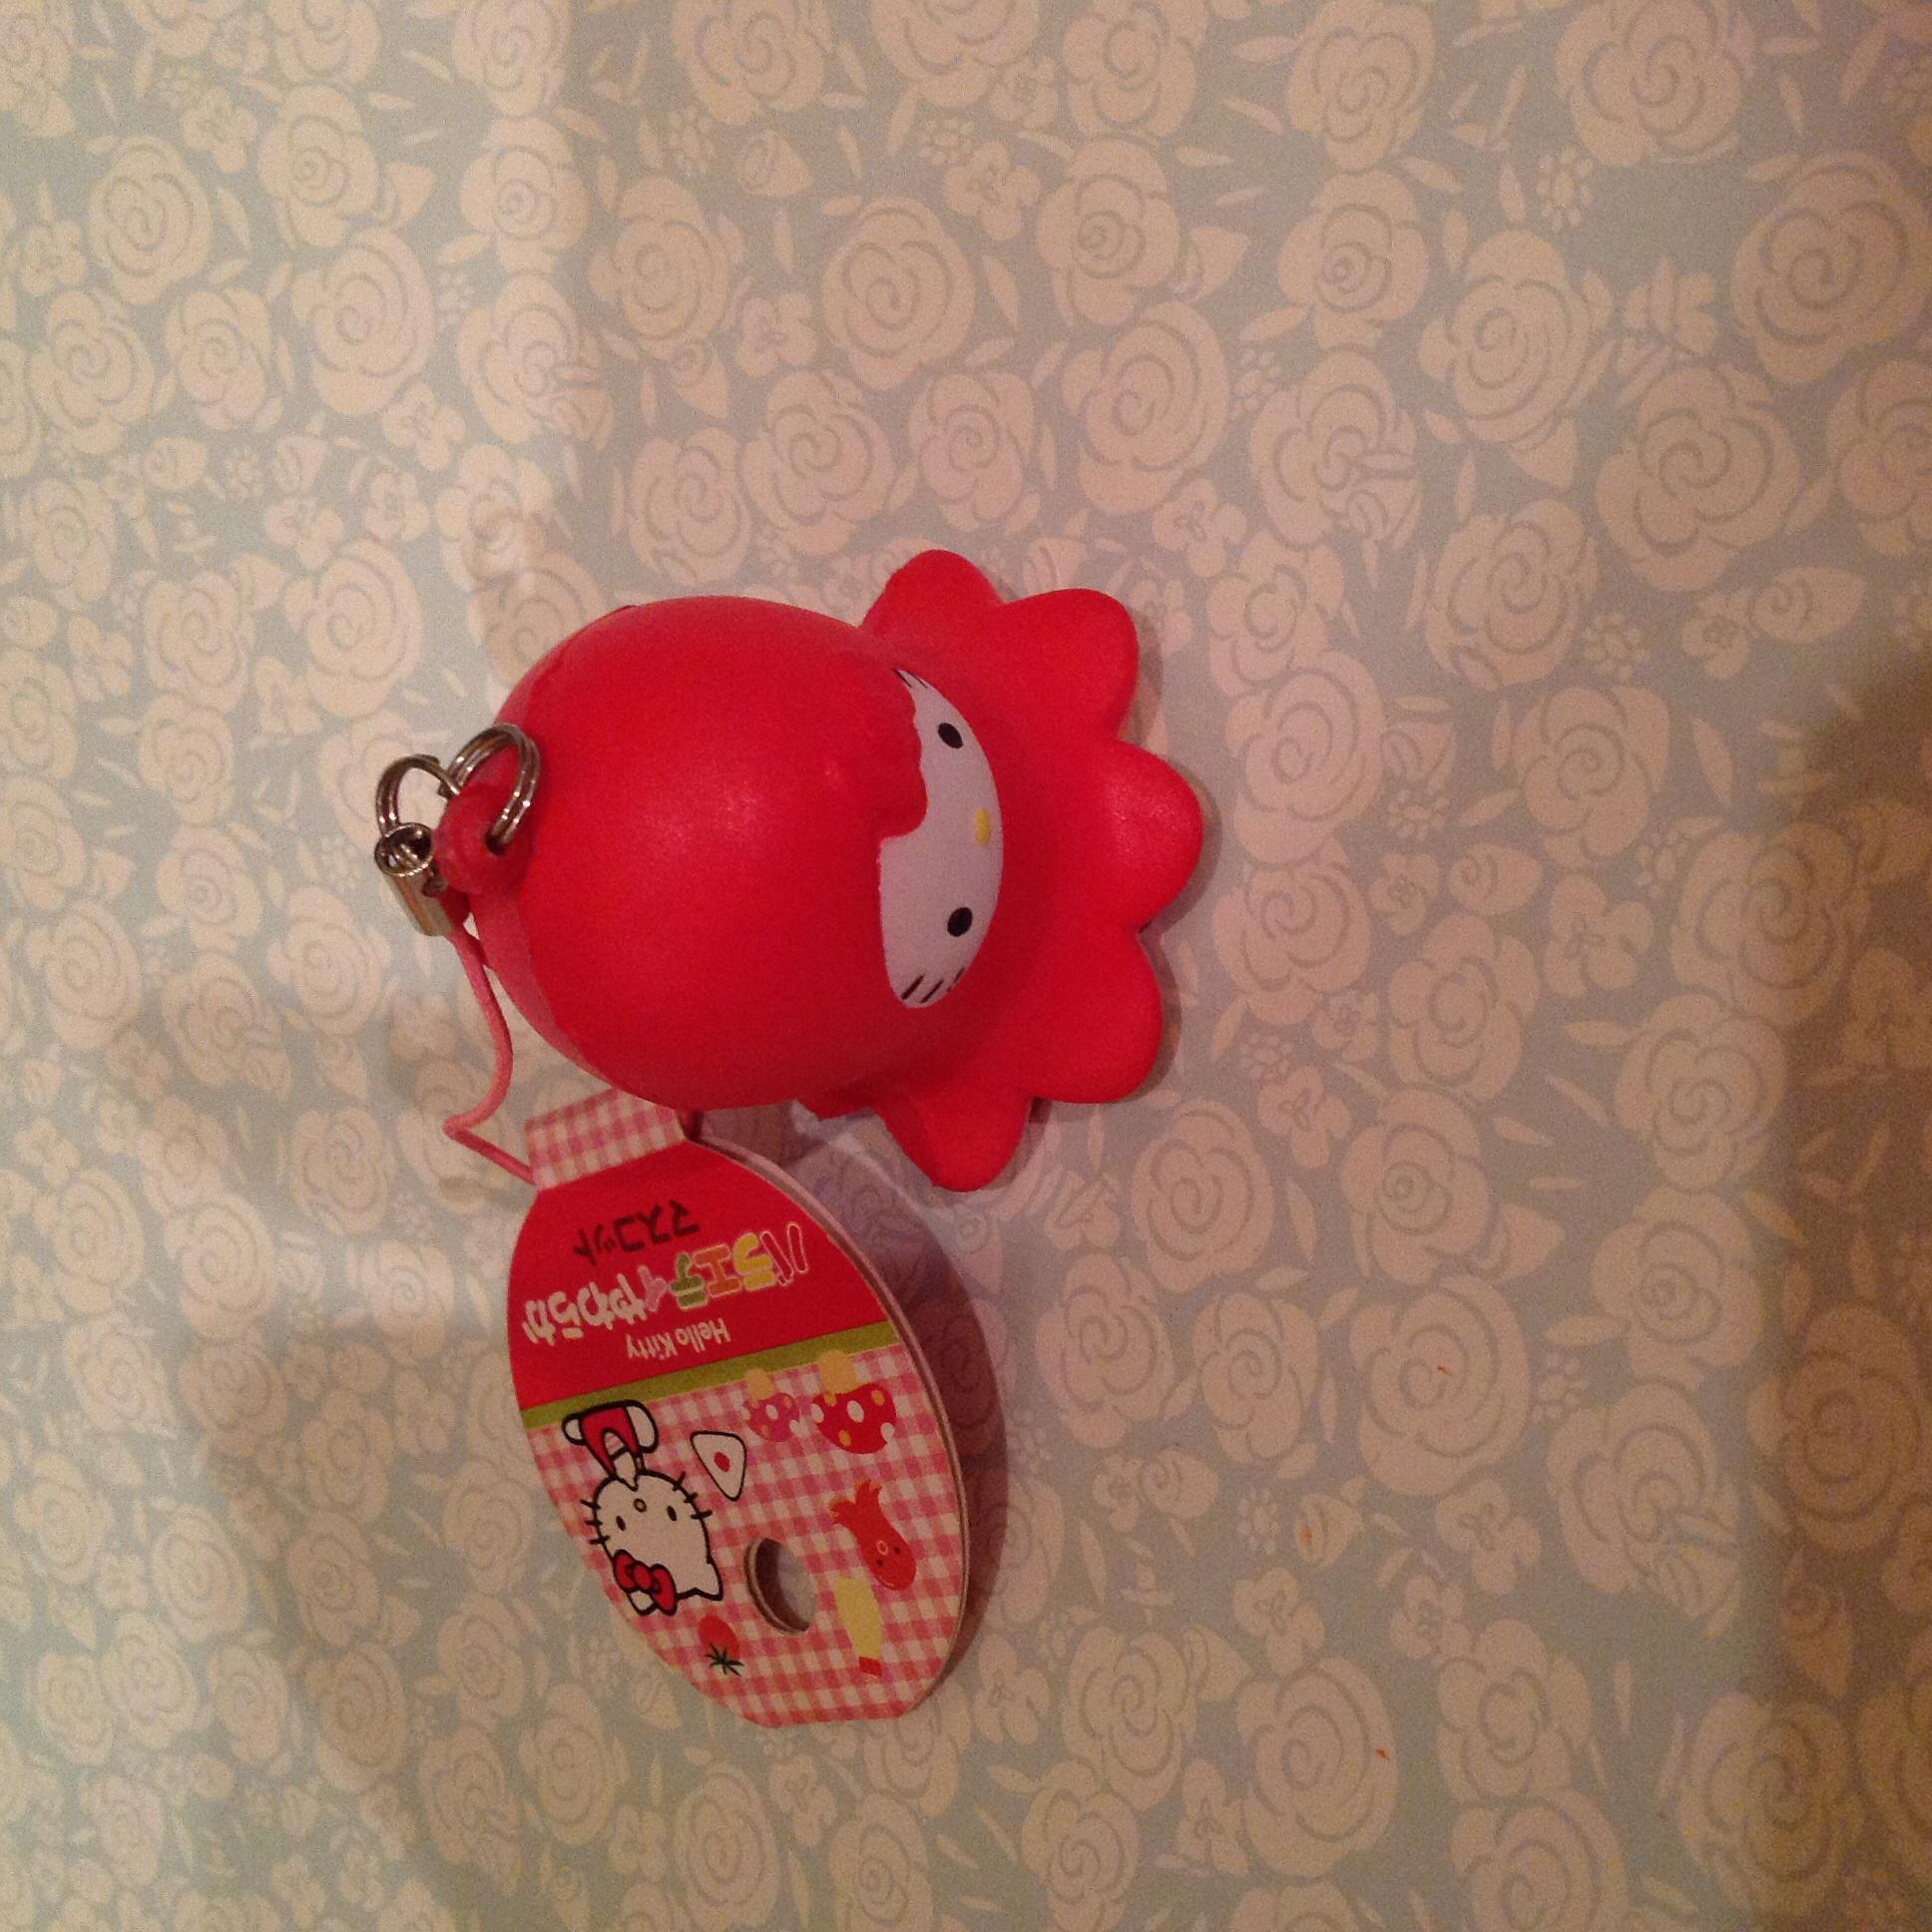 Squishy Sanrio Rare : Super rare hello kitty octopus / squid squishy ? SuzyCupcake ? Online Store Powered by Storenvy